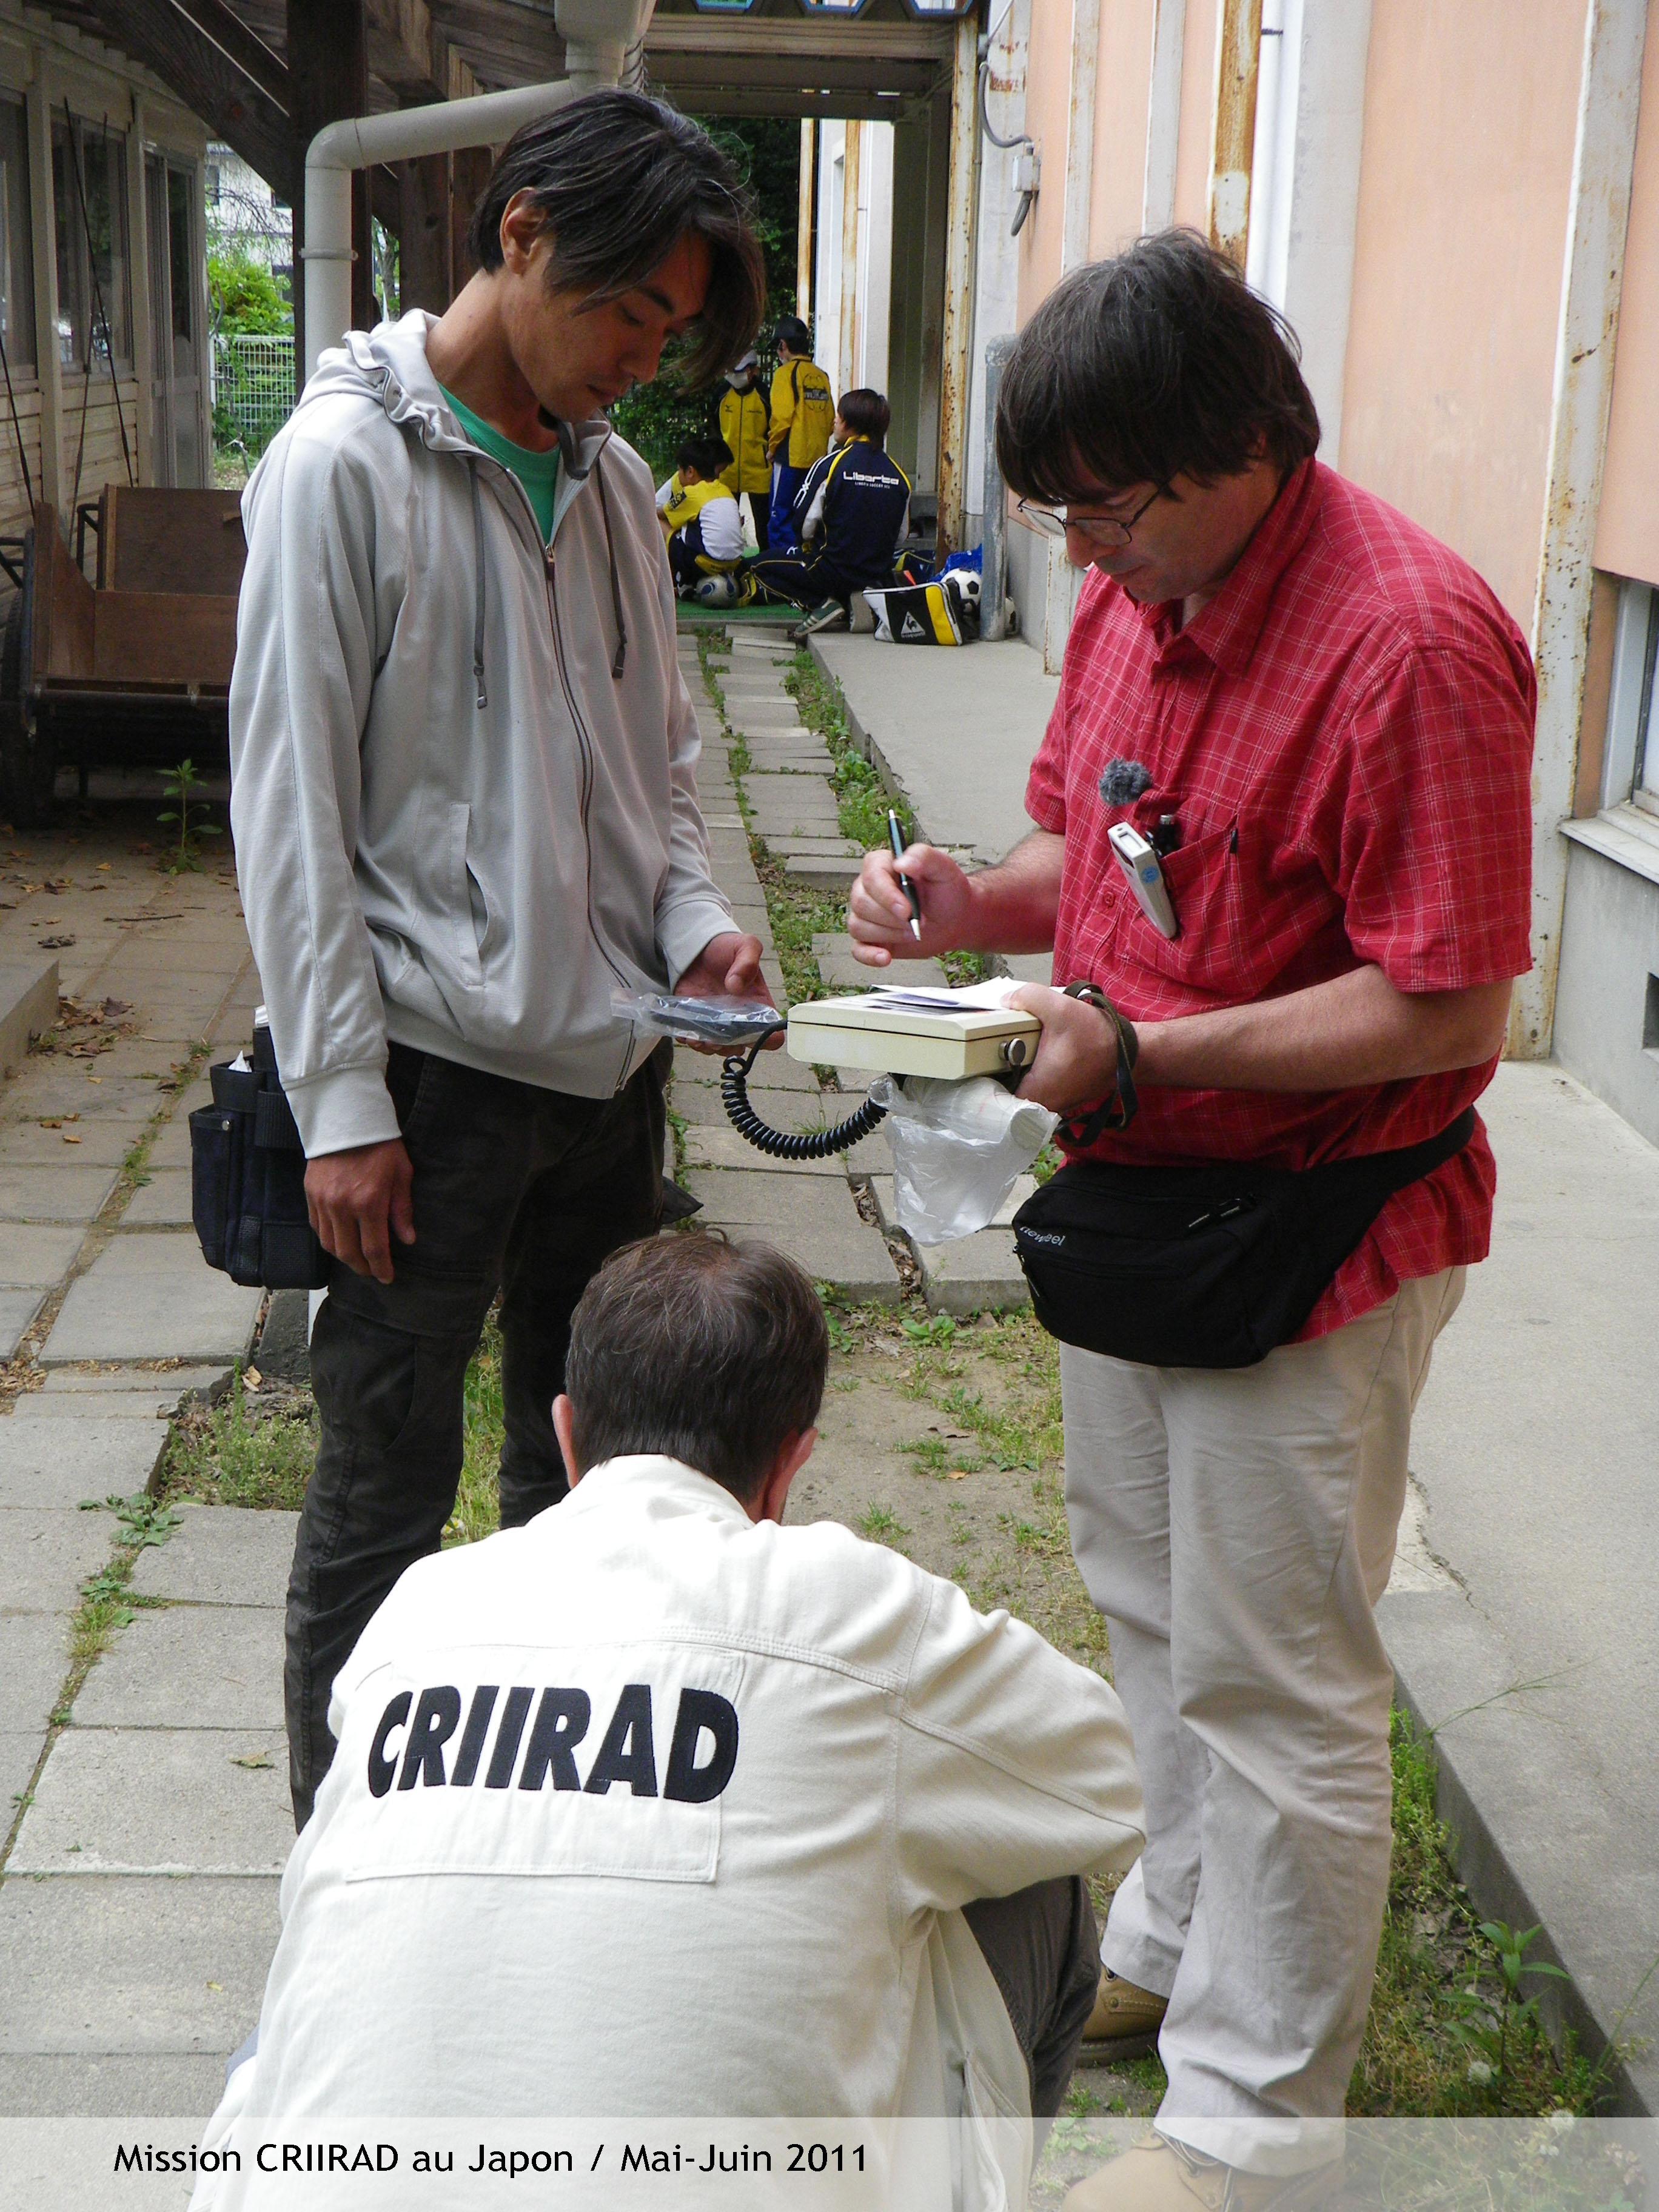 Mission CRIIRAD en préfecture de Fukushima, mai-juin 2011 - Mesures du niveau de radiation dans un école de la Ville de Fukushima CRIIRAD - Bruno CHAREYRON, Christian COURBON ONG locale - Wataru IWATA